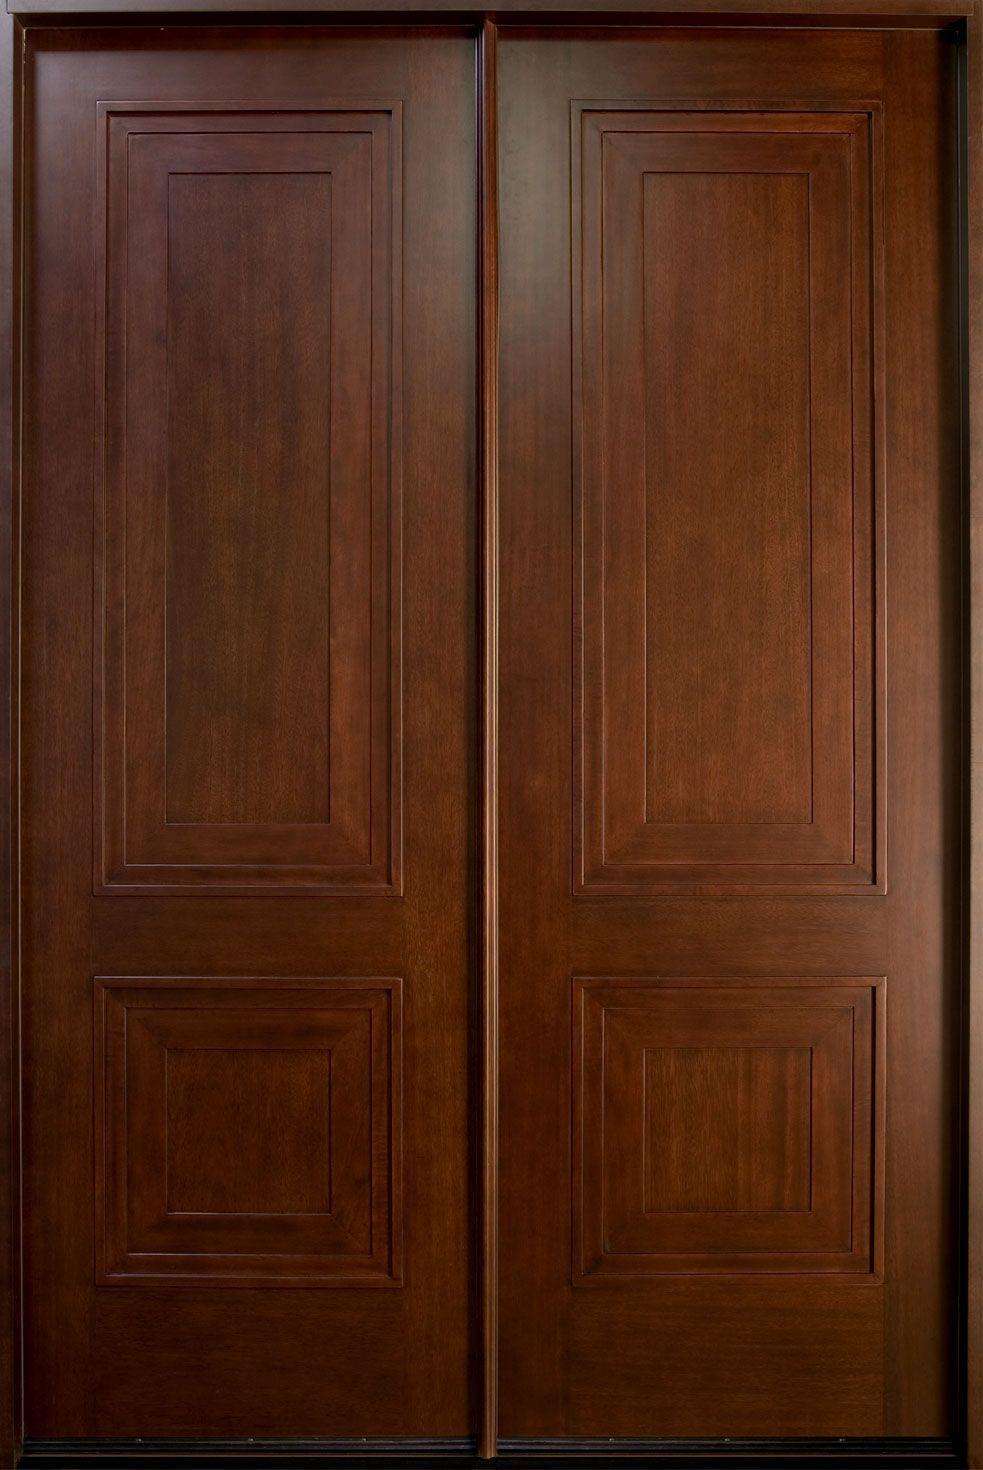 mahogany walls entry - Google Search   Doors & Windows   Pinterest ...